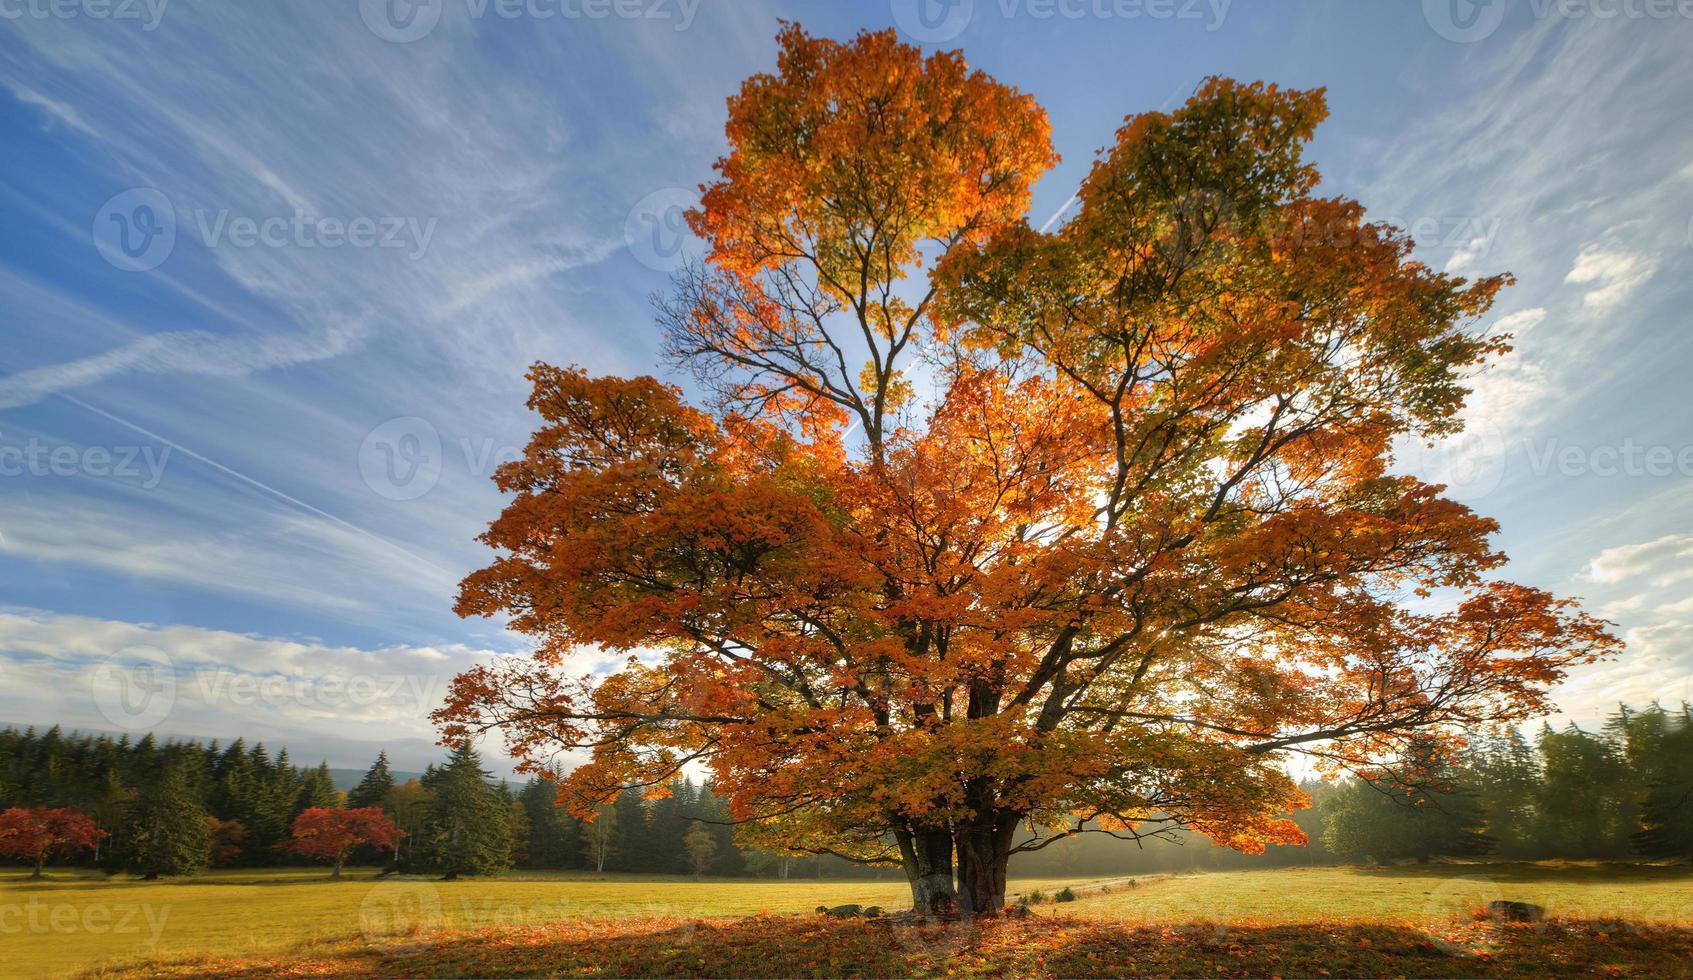 grande autunno quercia ed erba verde su un prato foto